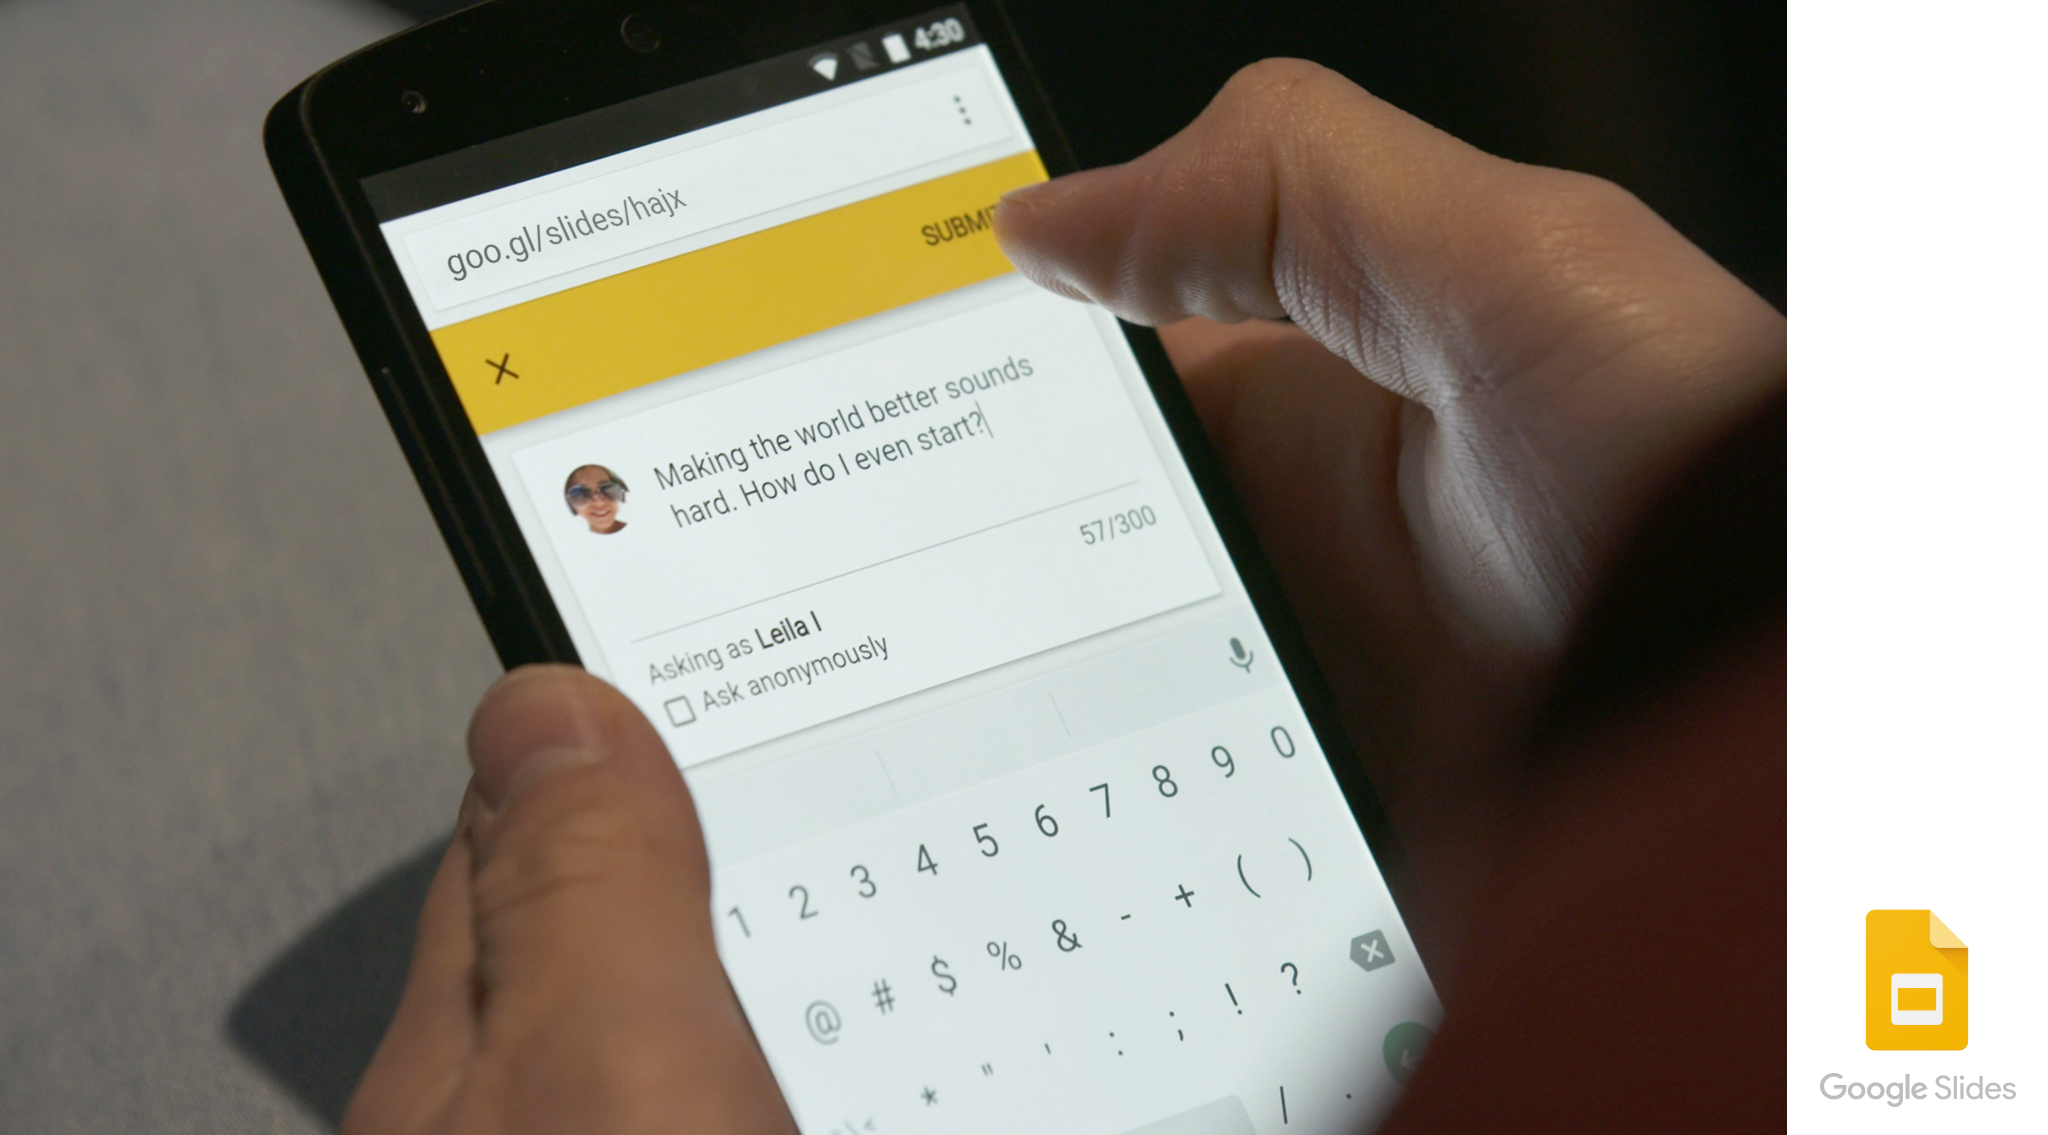 Google Slides Q&A feature.